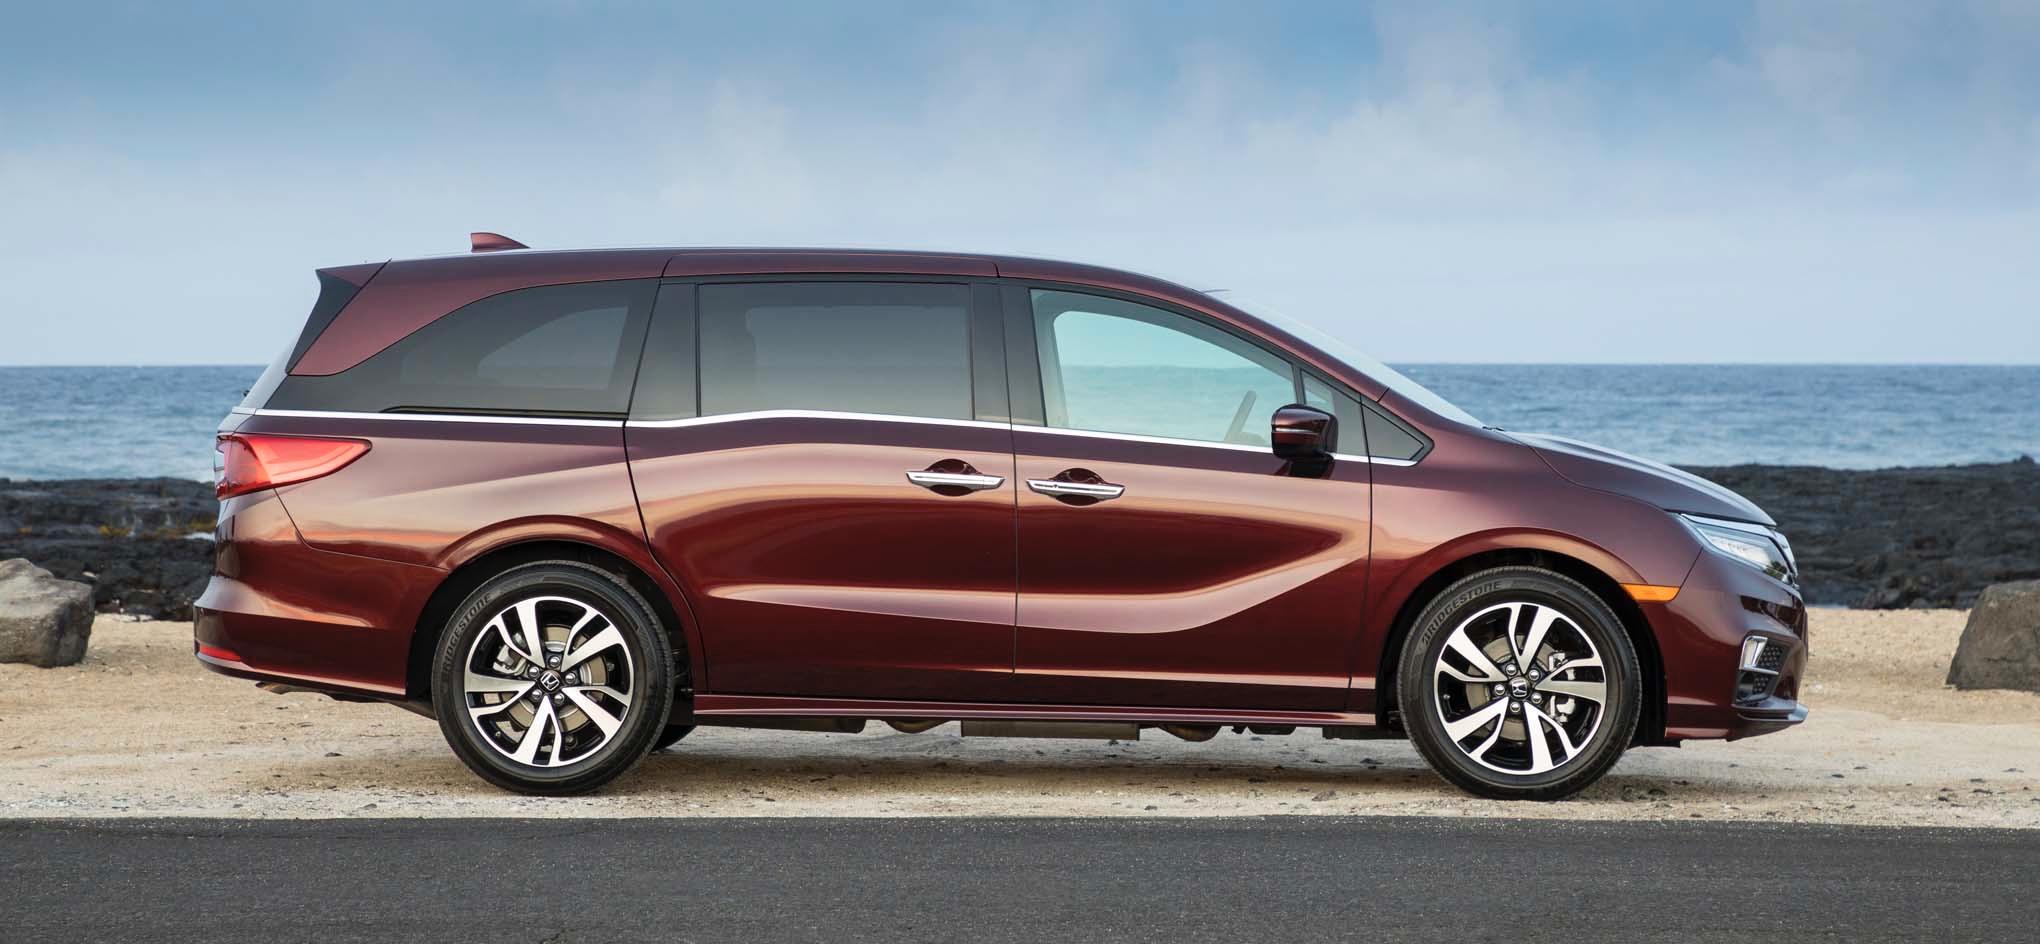 2018 Honda Odyssey Review Ball Honda New Amp Used Cars